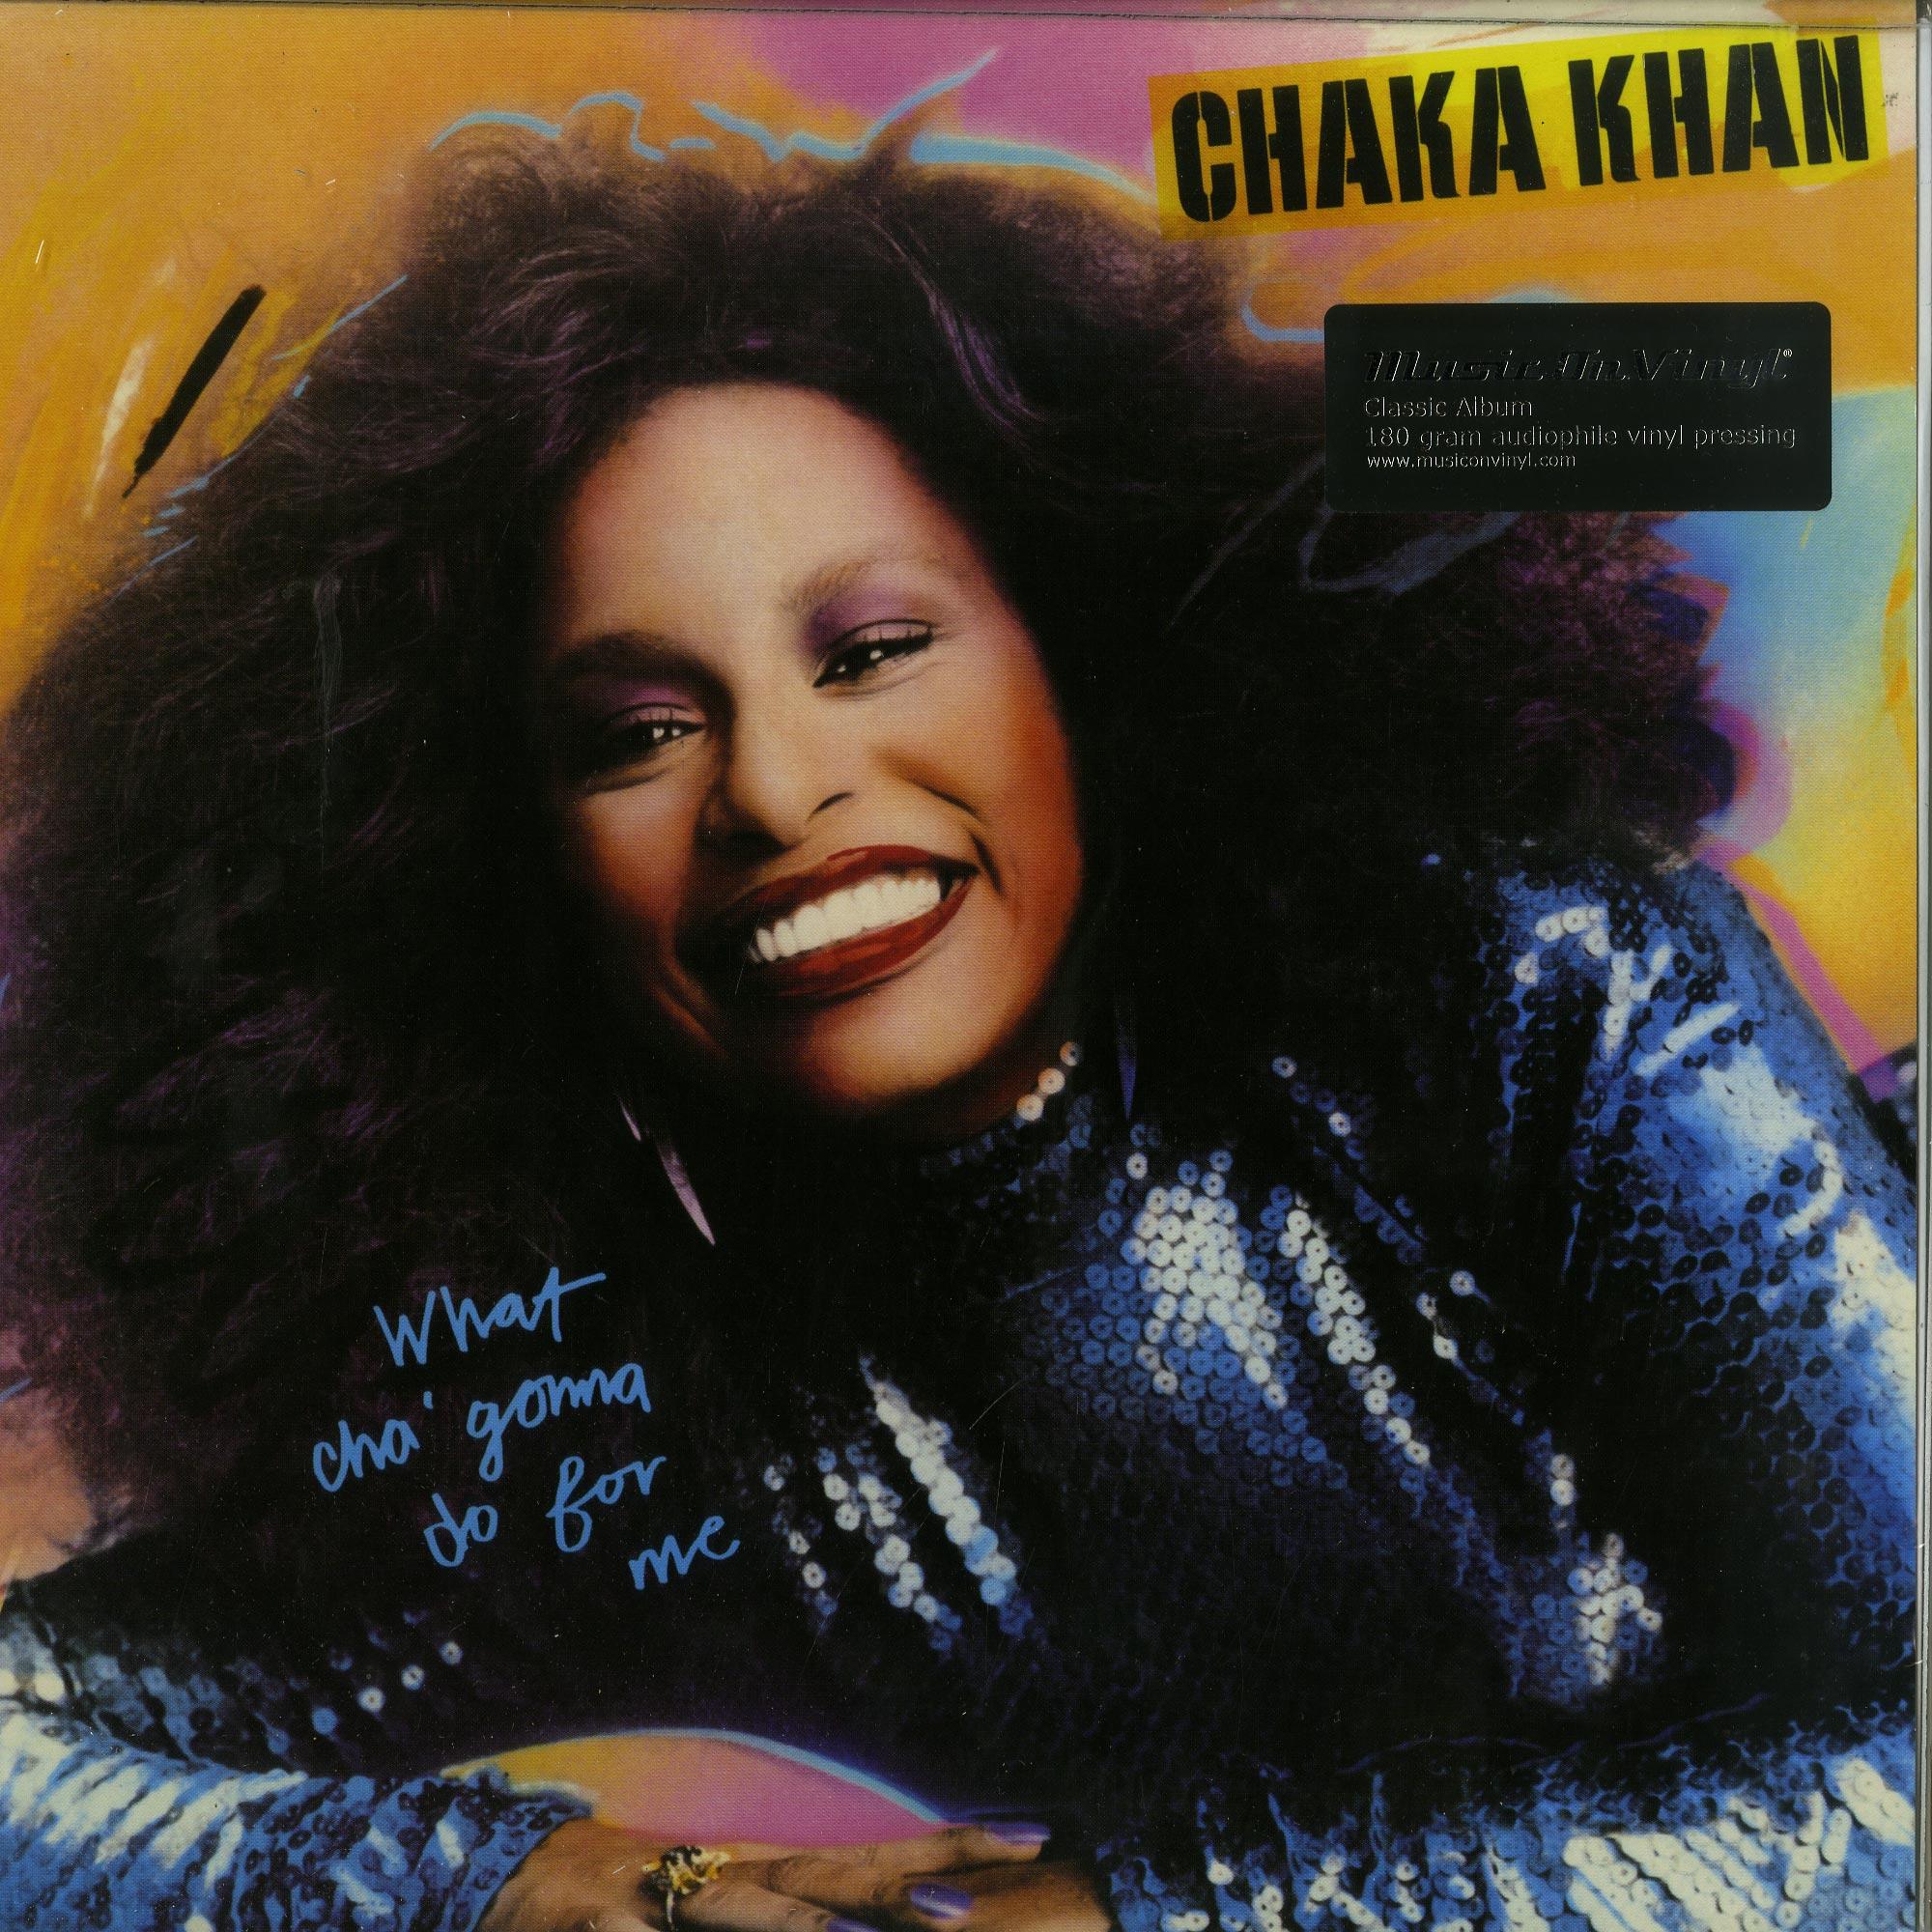 Chaka Khan - WHAT CHA GONNA DO FOR ME